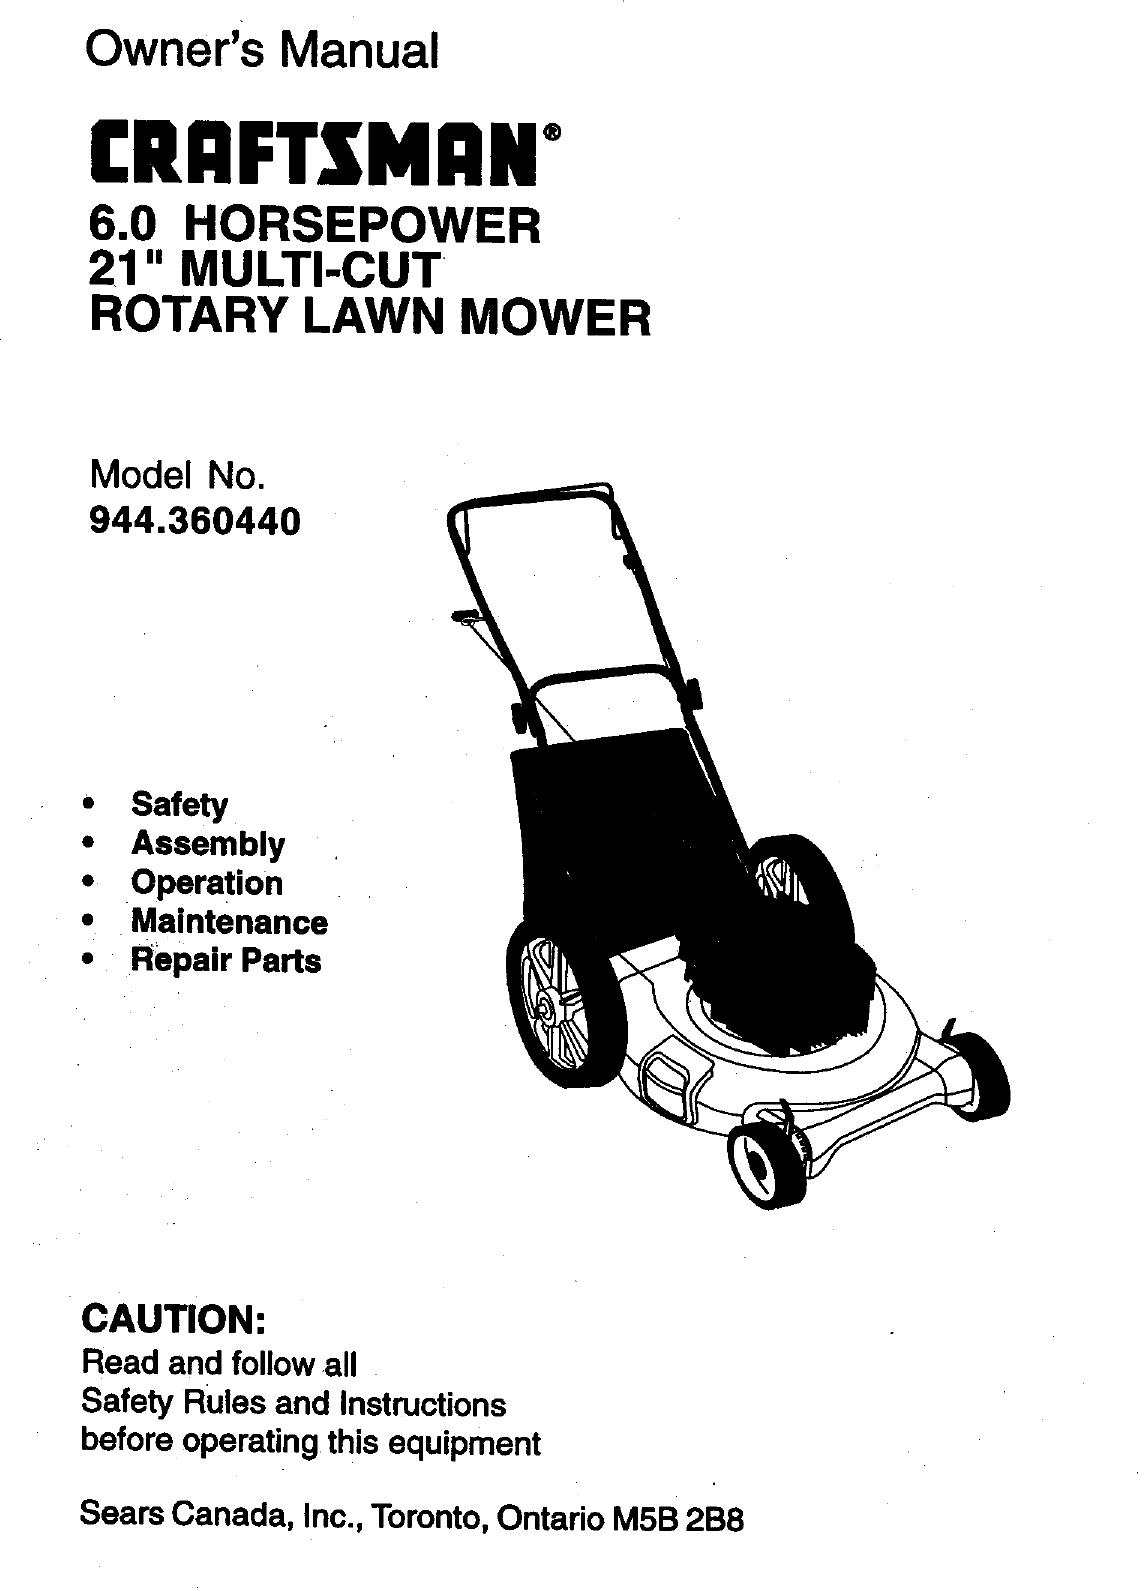 CRAFTSMAN Walk Behind Lawnmower, Gas Manual L0010003